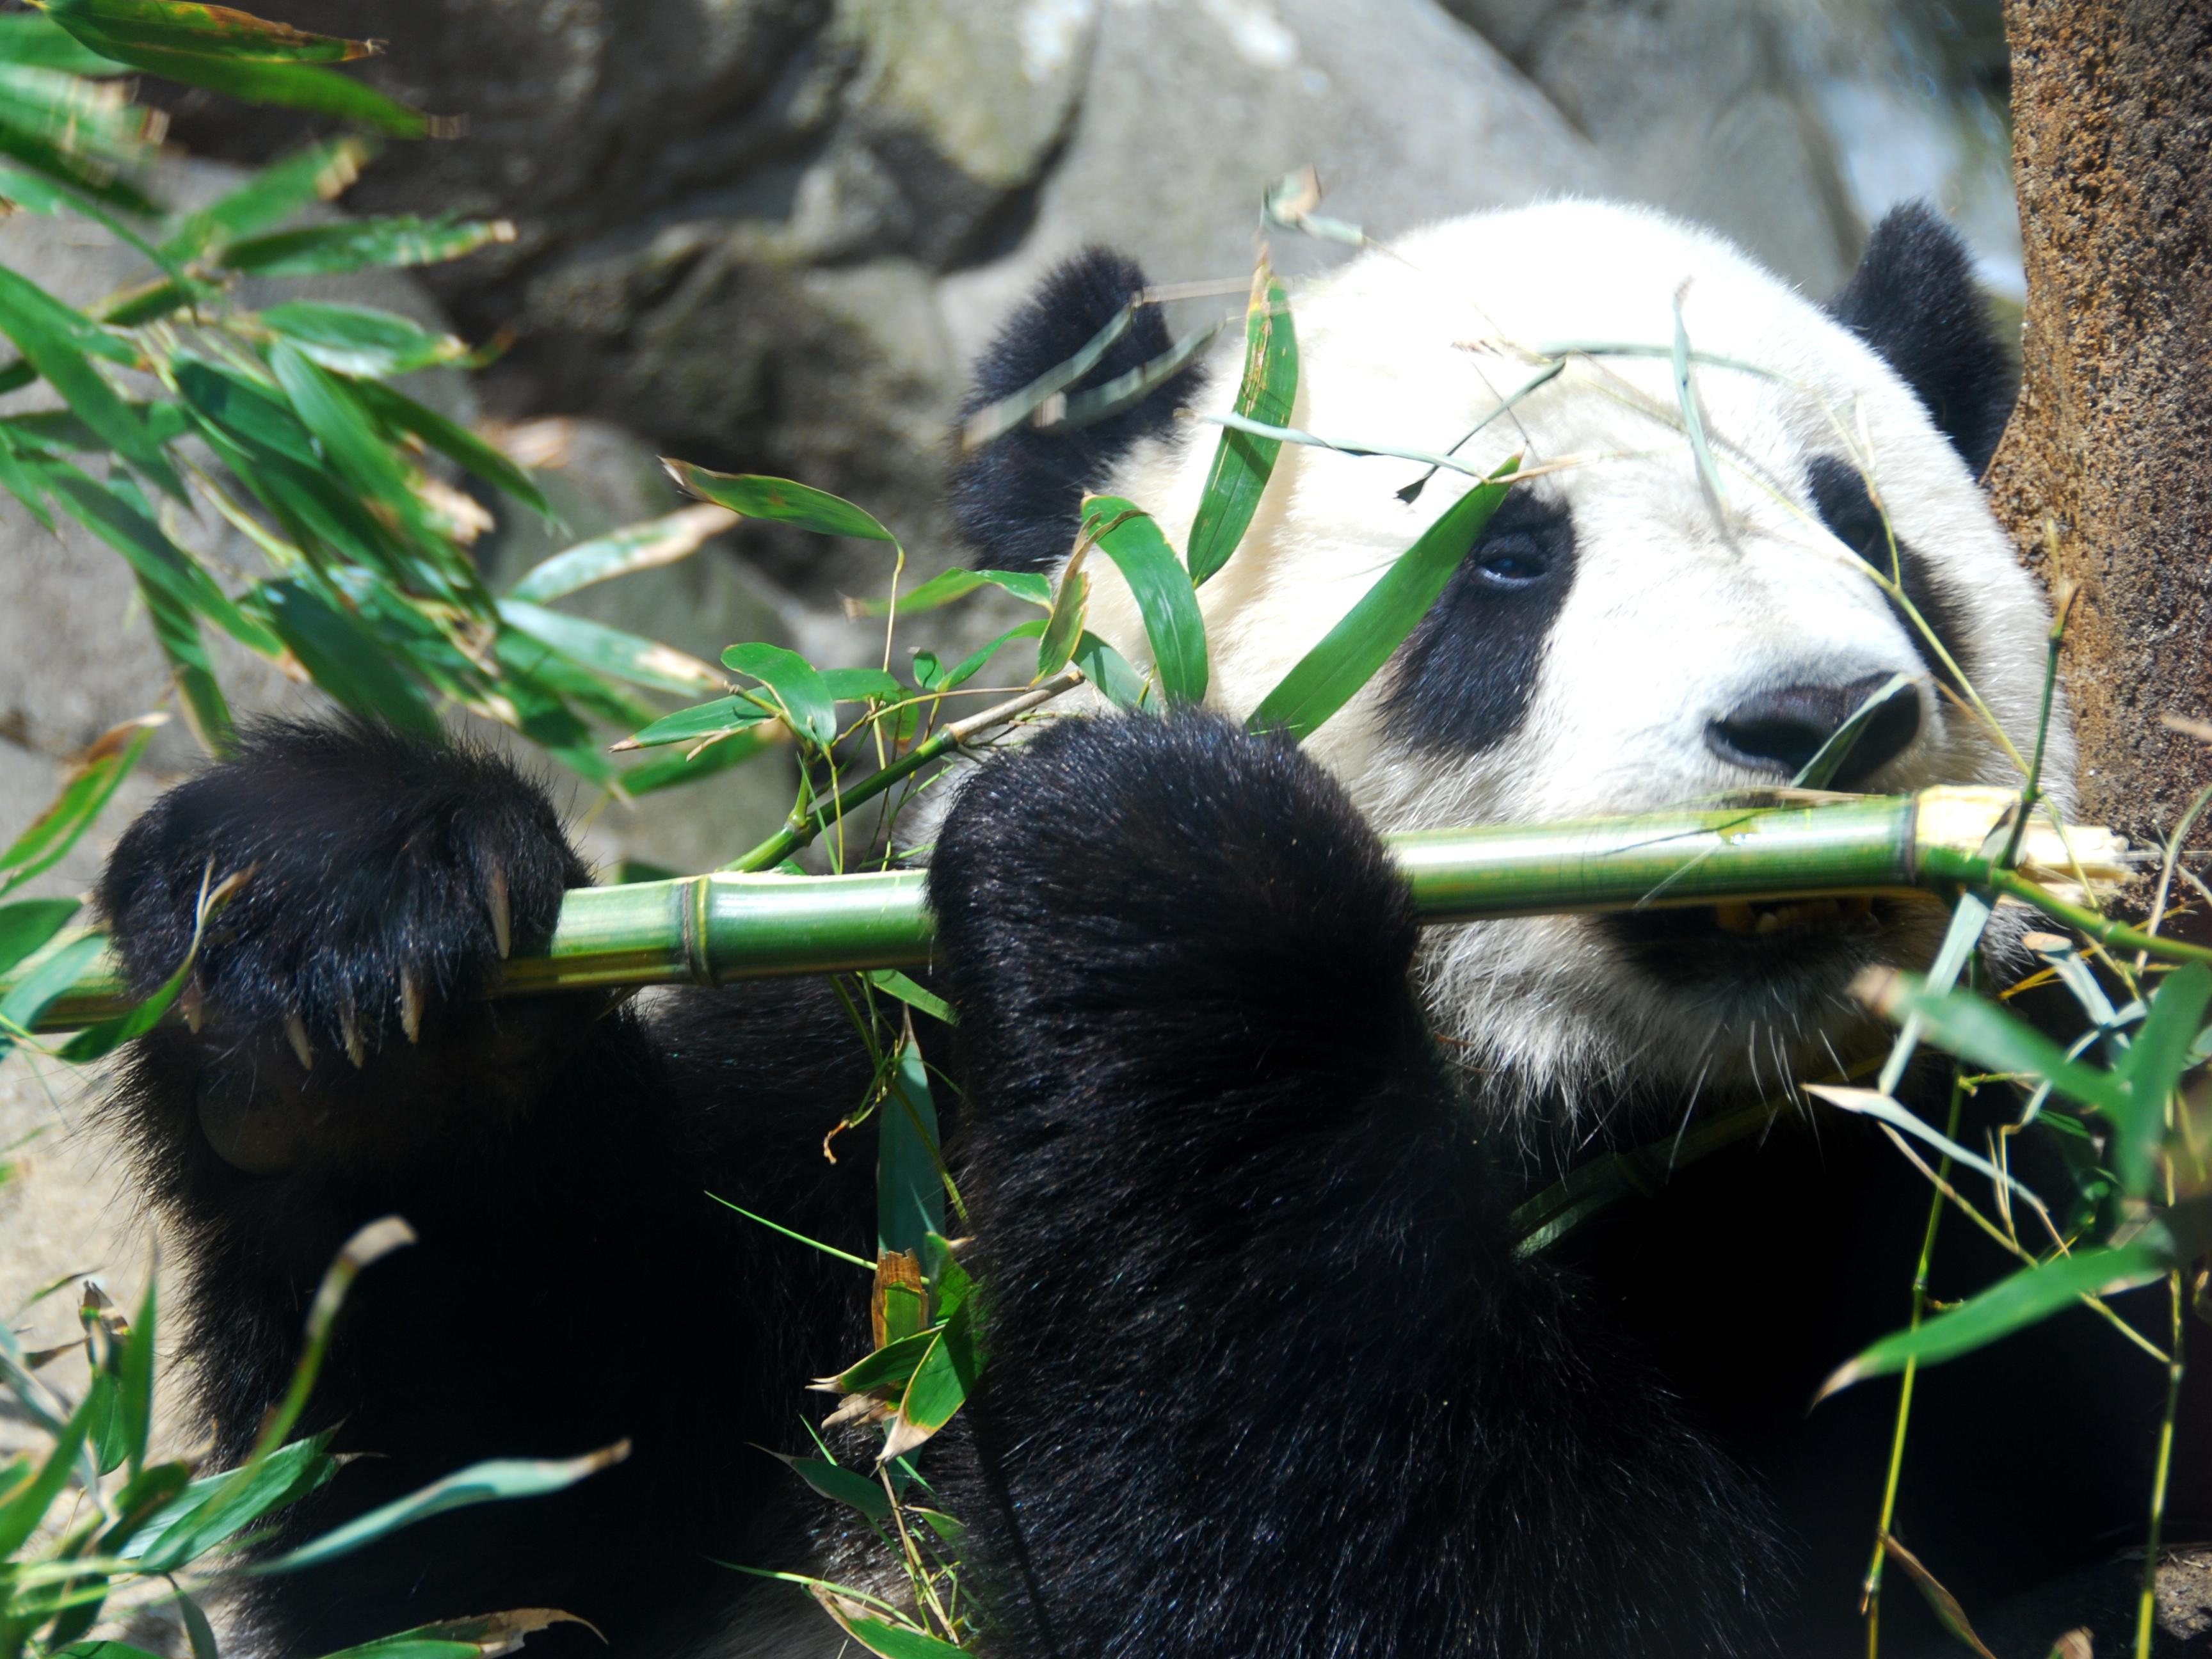 File:Giant Panda Tai Shan.JPG - Wikipedia